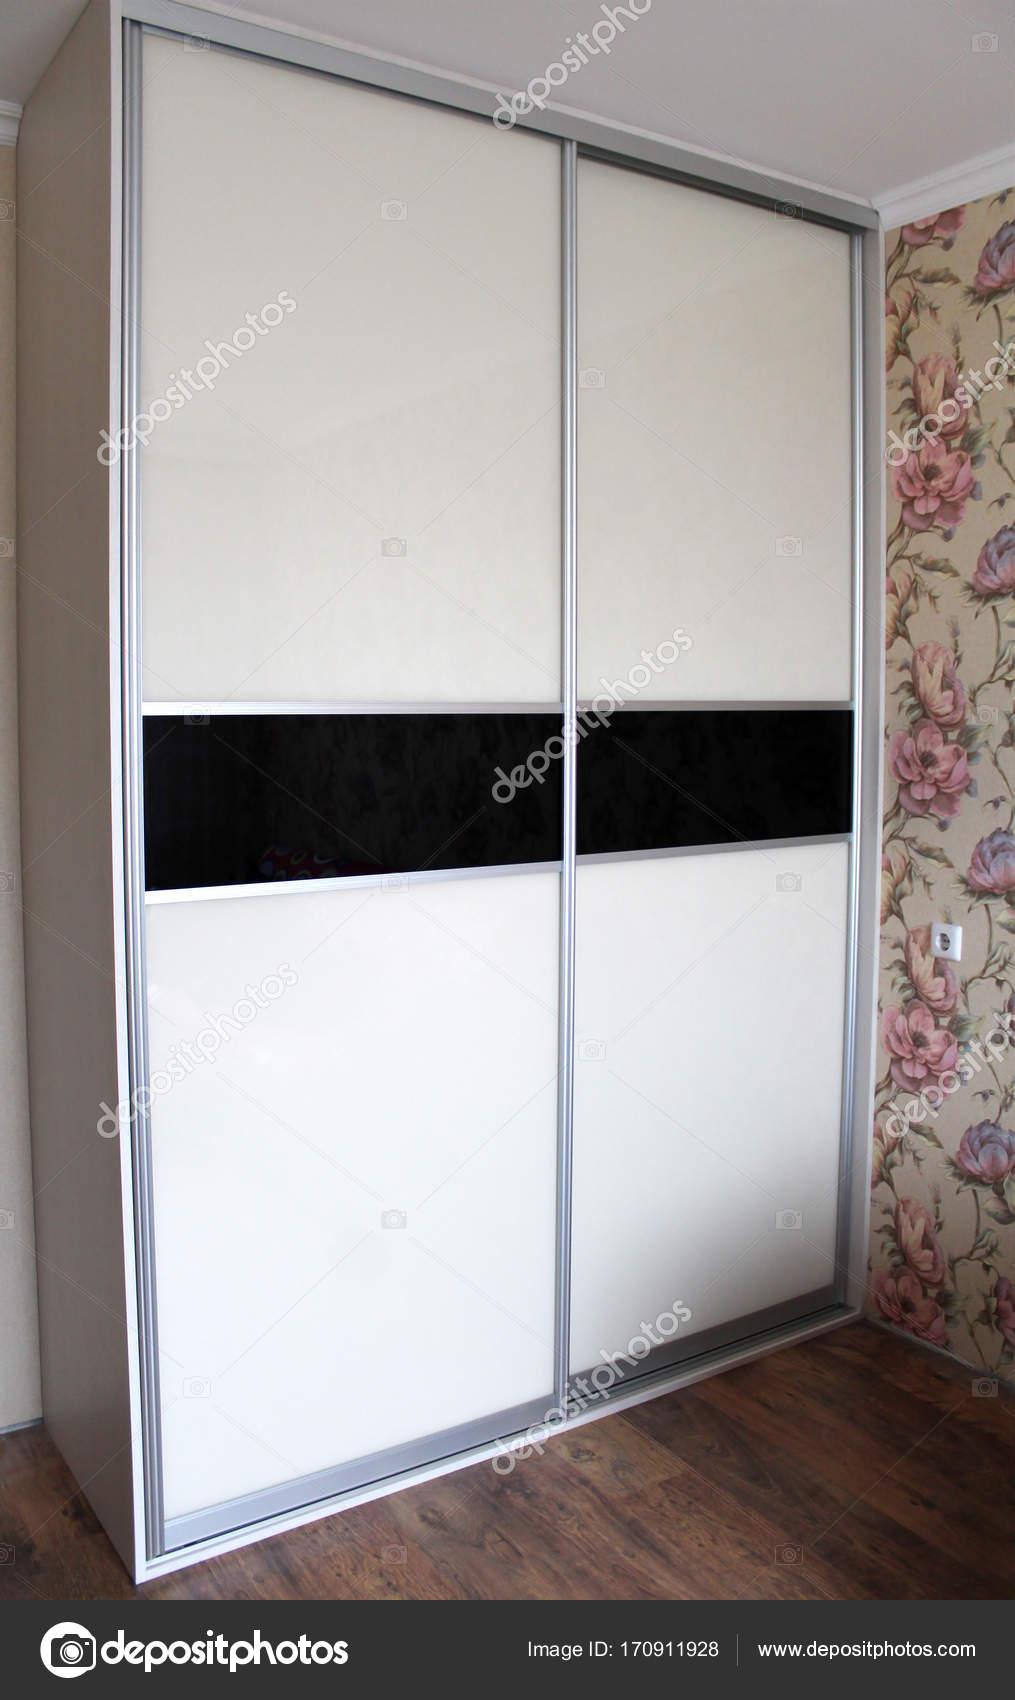 https://st3.depositphotos.com/4233899/17091/i/1600/depositphotos_170911928-stock-photo-wardrobe-with-sliding-doors-furniture.jpg